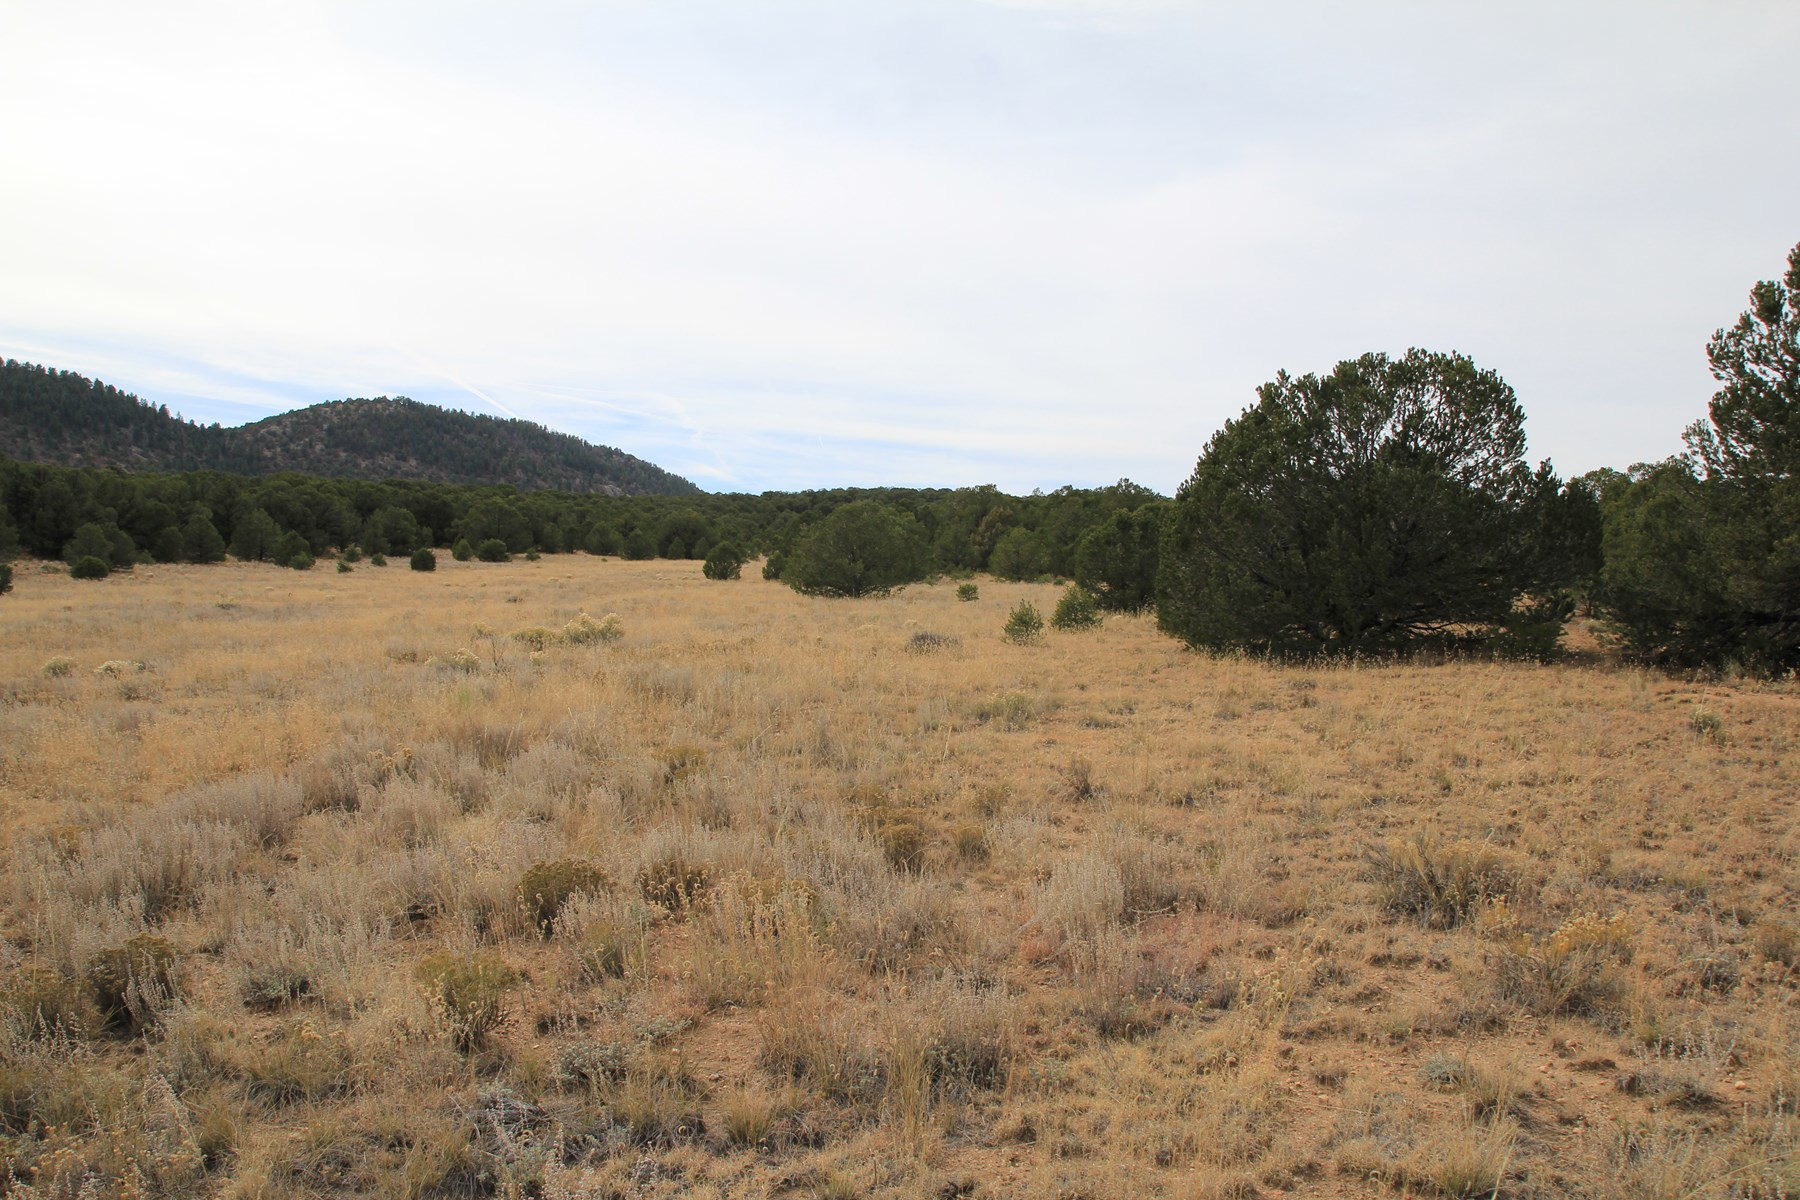 Land in Westcliffe Colorado, Custer County